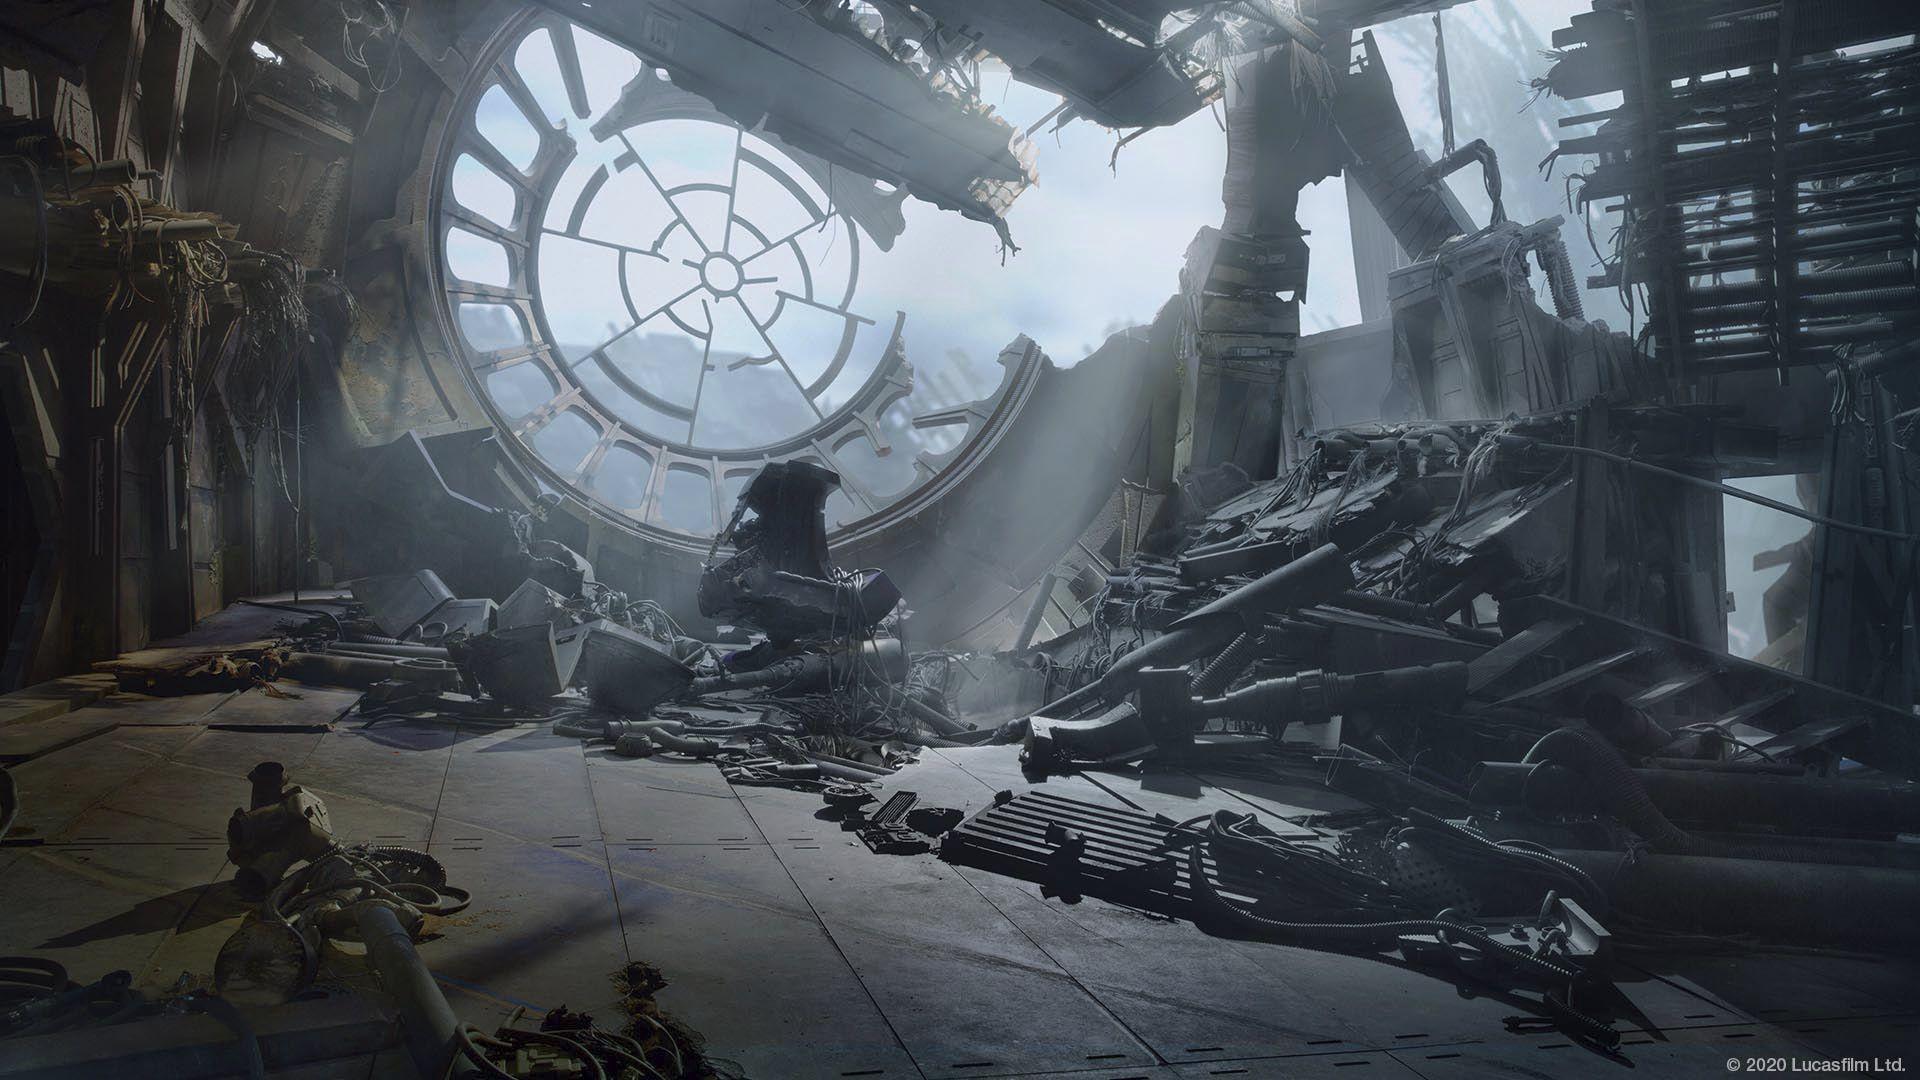 Star Wars Backgrounds For Video Calls Meetings Starwars Com Star Wars Background Background Star Wars Wallpaper